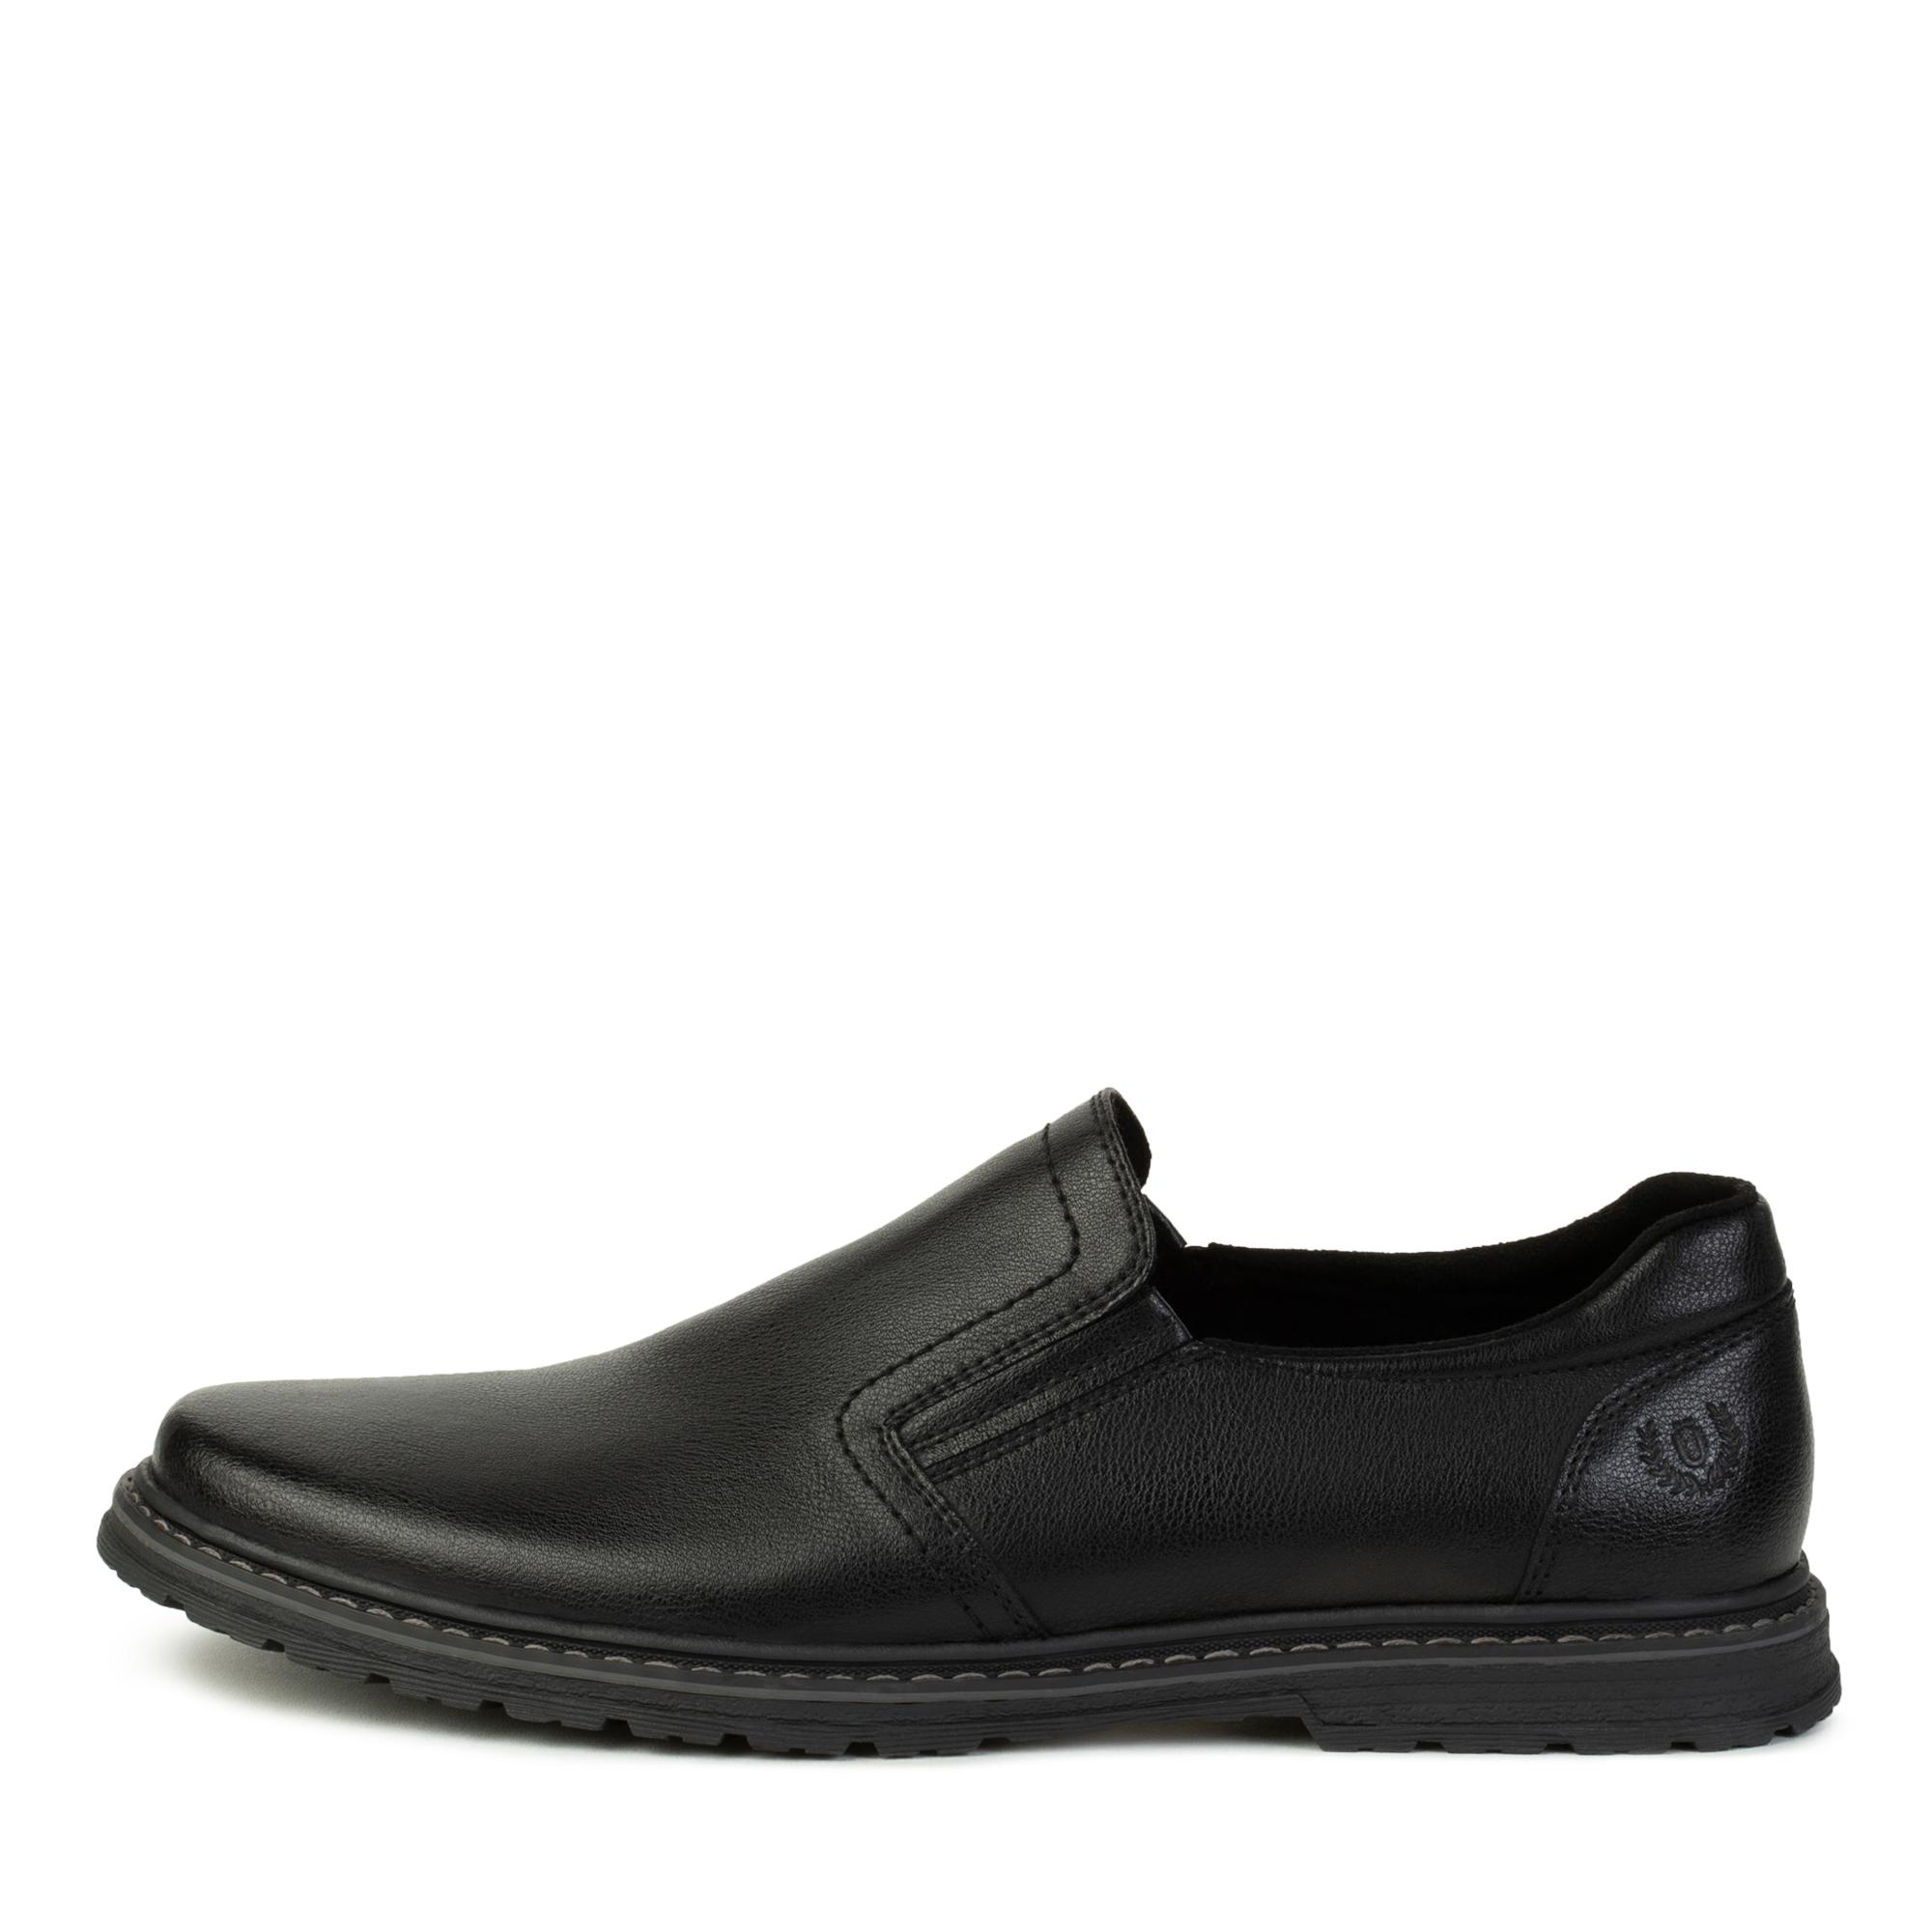 Туфли/полуботинки MUNZ Shoes 098-513A-2602